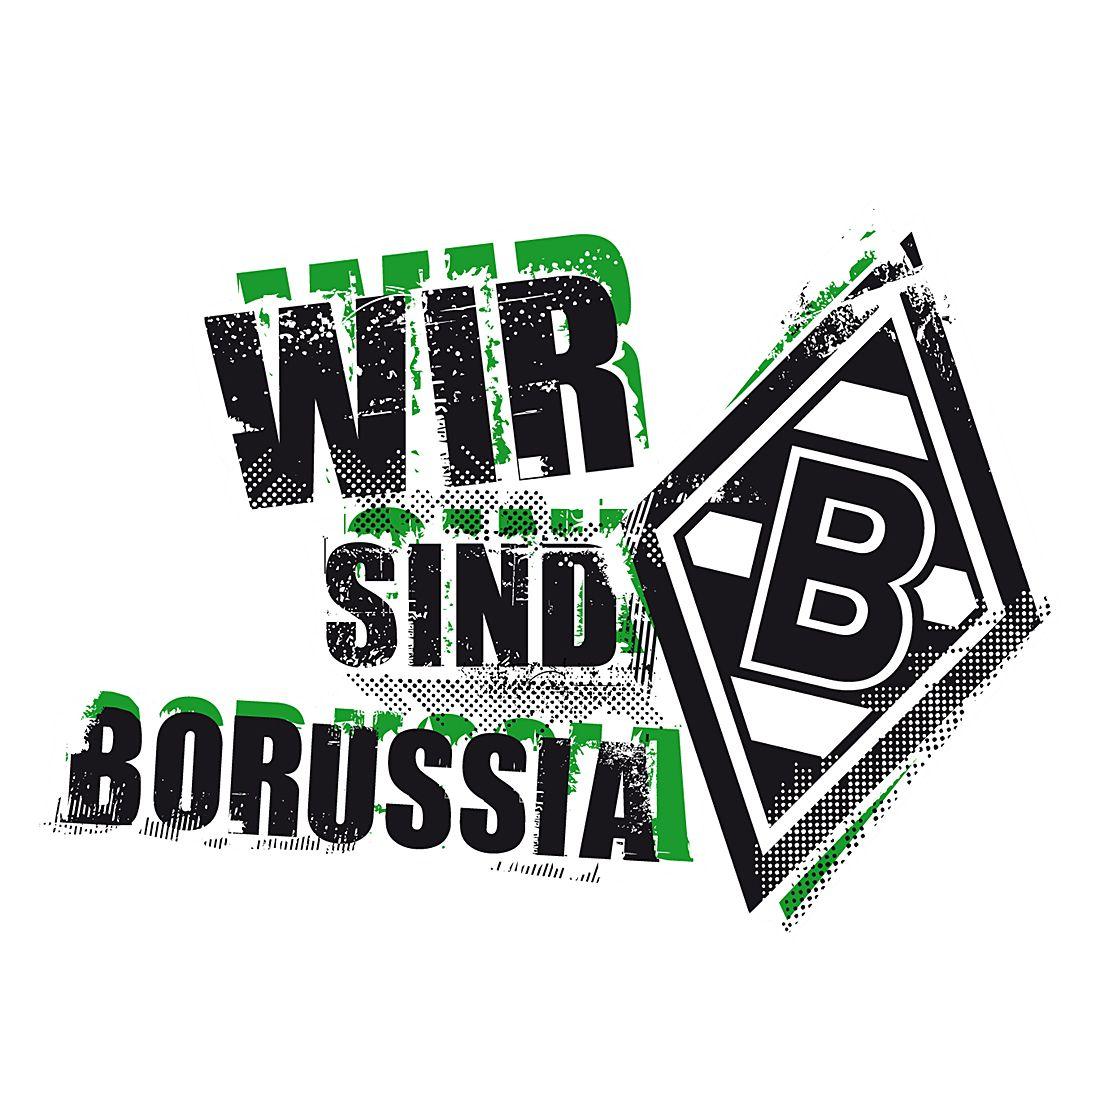 Wir Sind Borussia Vfl Borussia Monchengladbach Borussia Monchengladbach Borussia